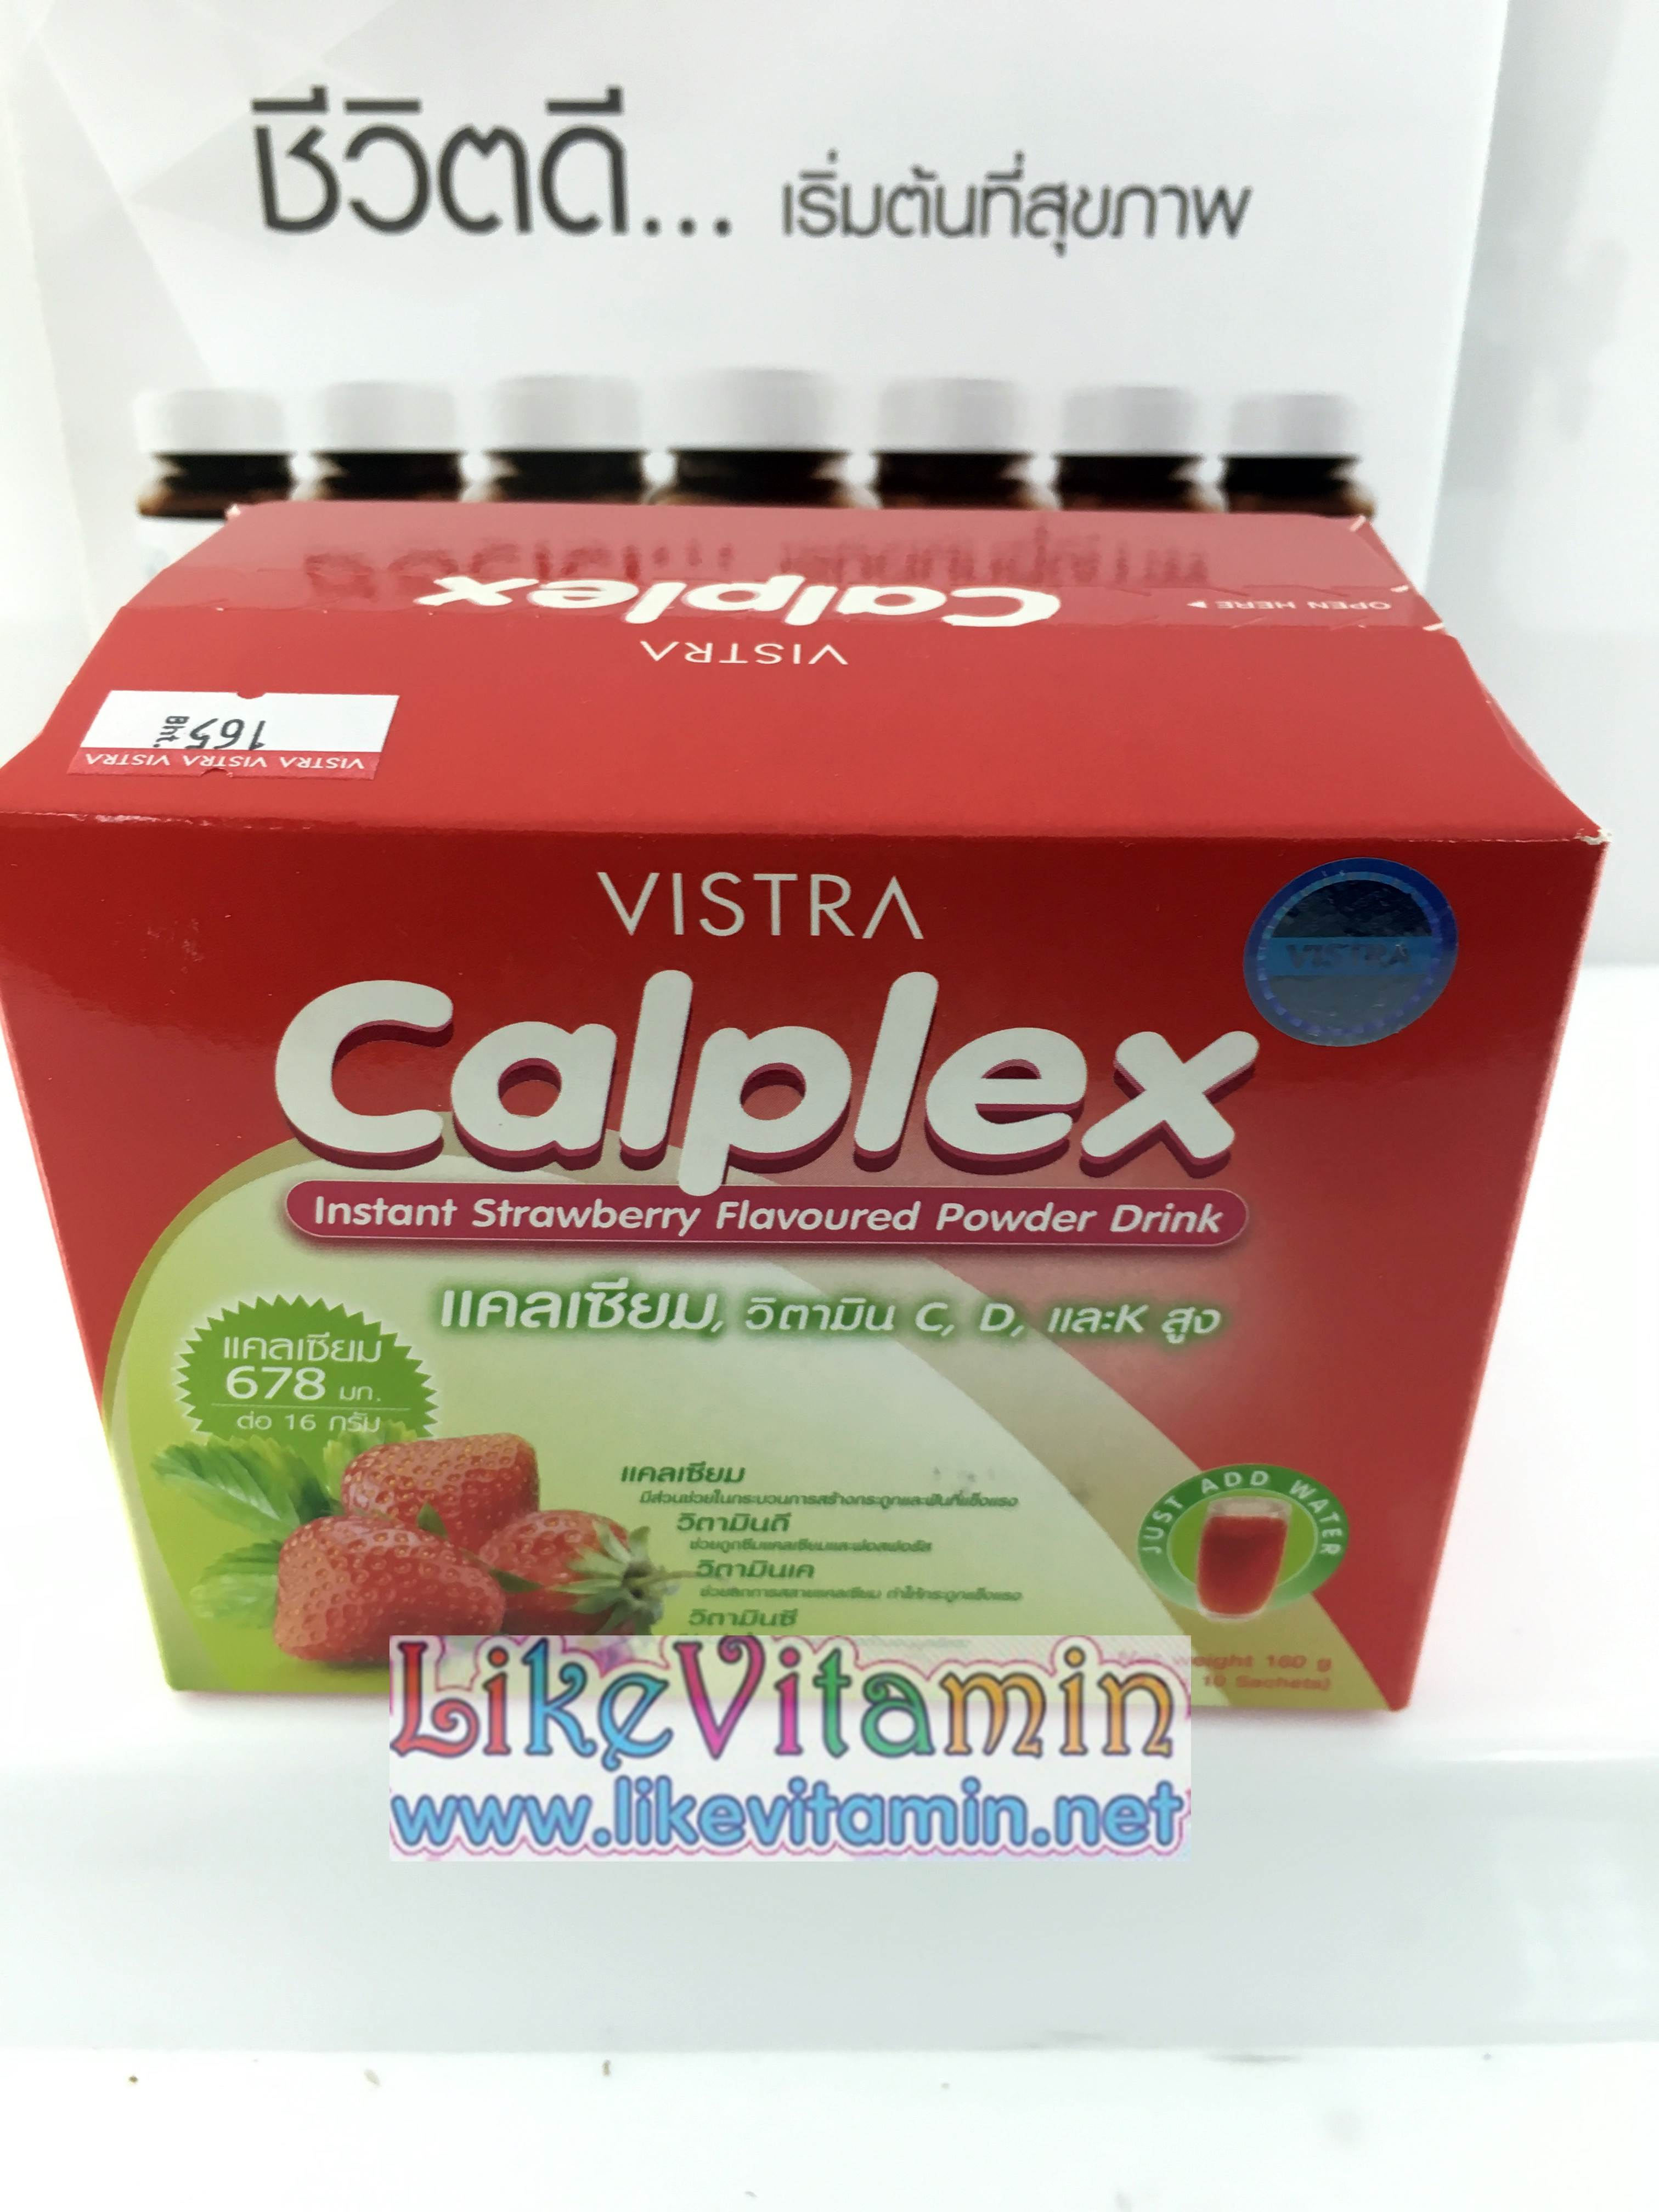 Vistra Calplex Instant Powder Drink แคลเพล็กซ์ แคลเซียม ชนิดผงรส สตรอเบอร์รี่ รสชาติอร่อย ชงง่าย